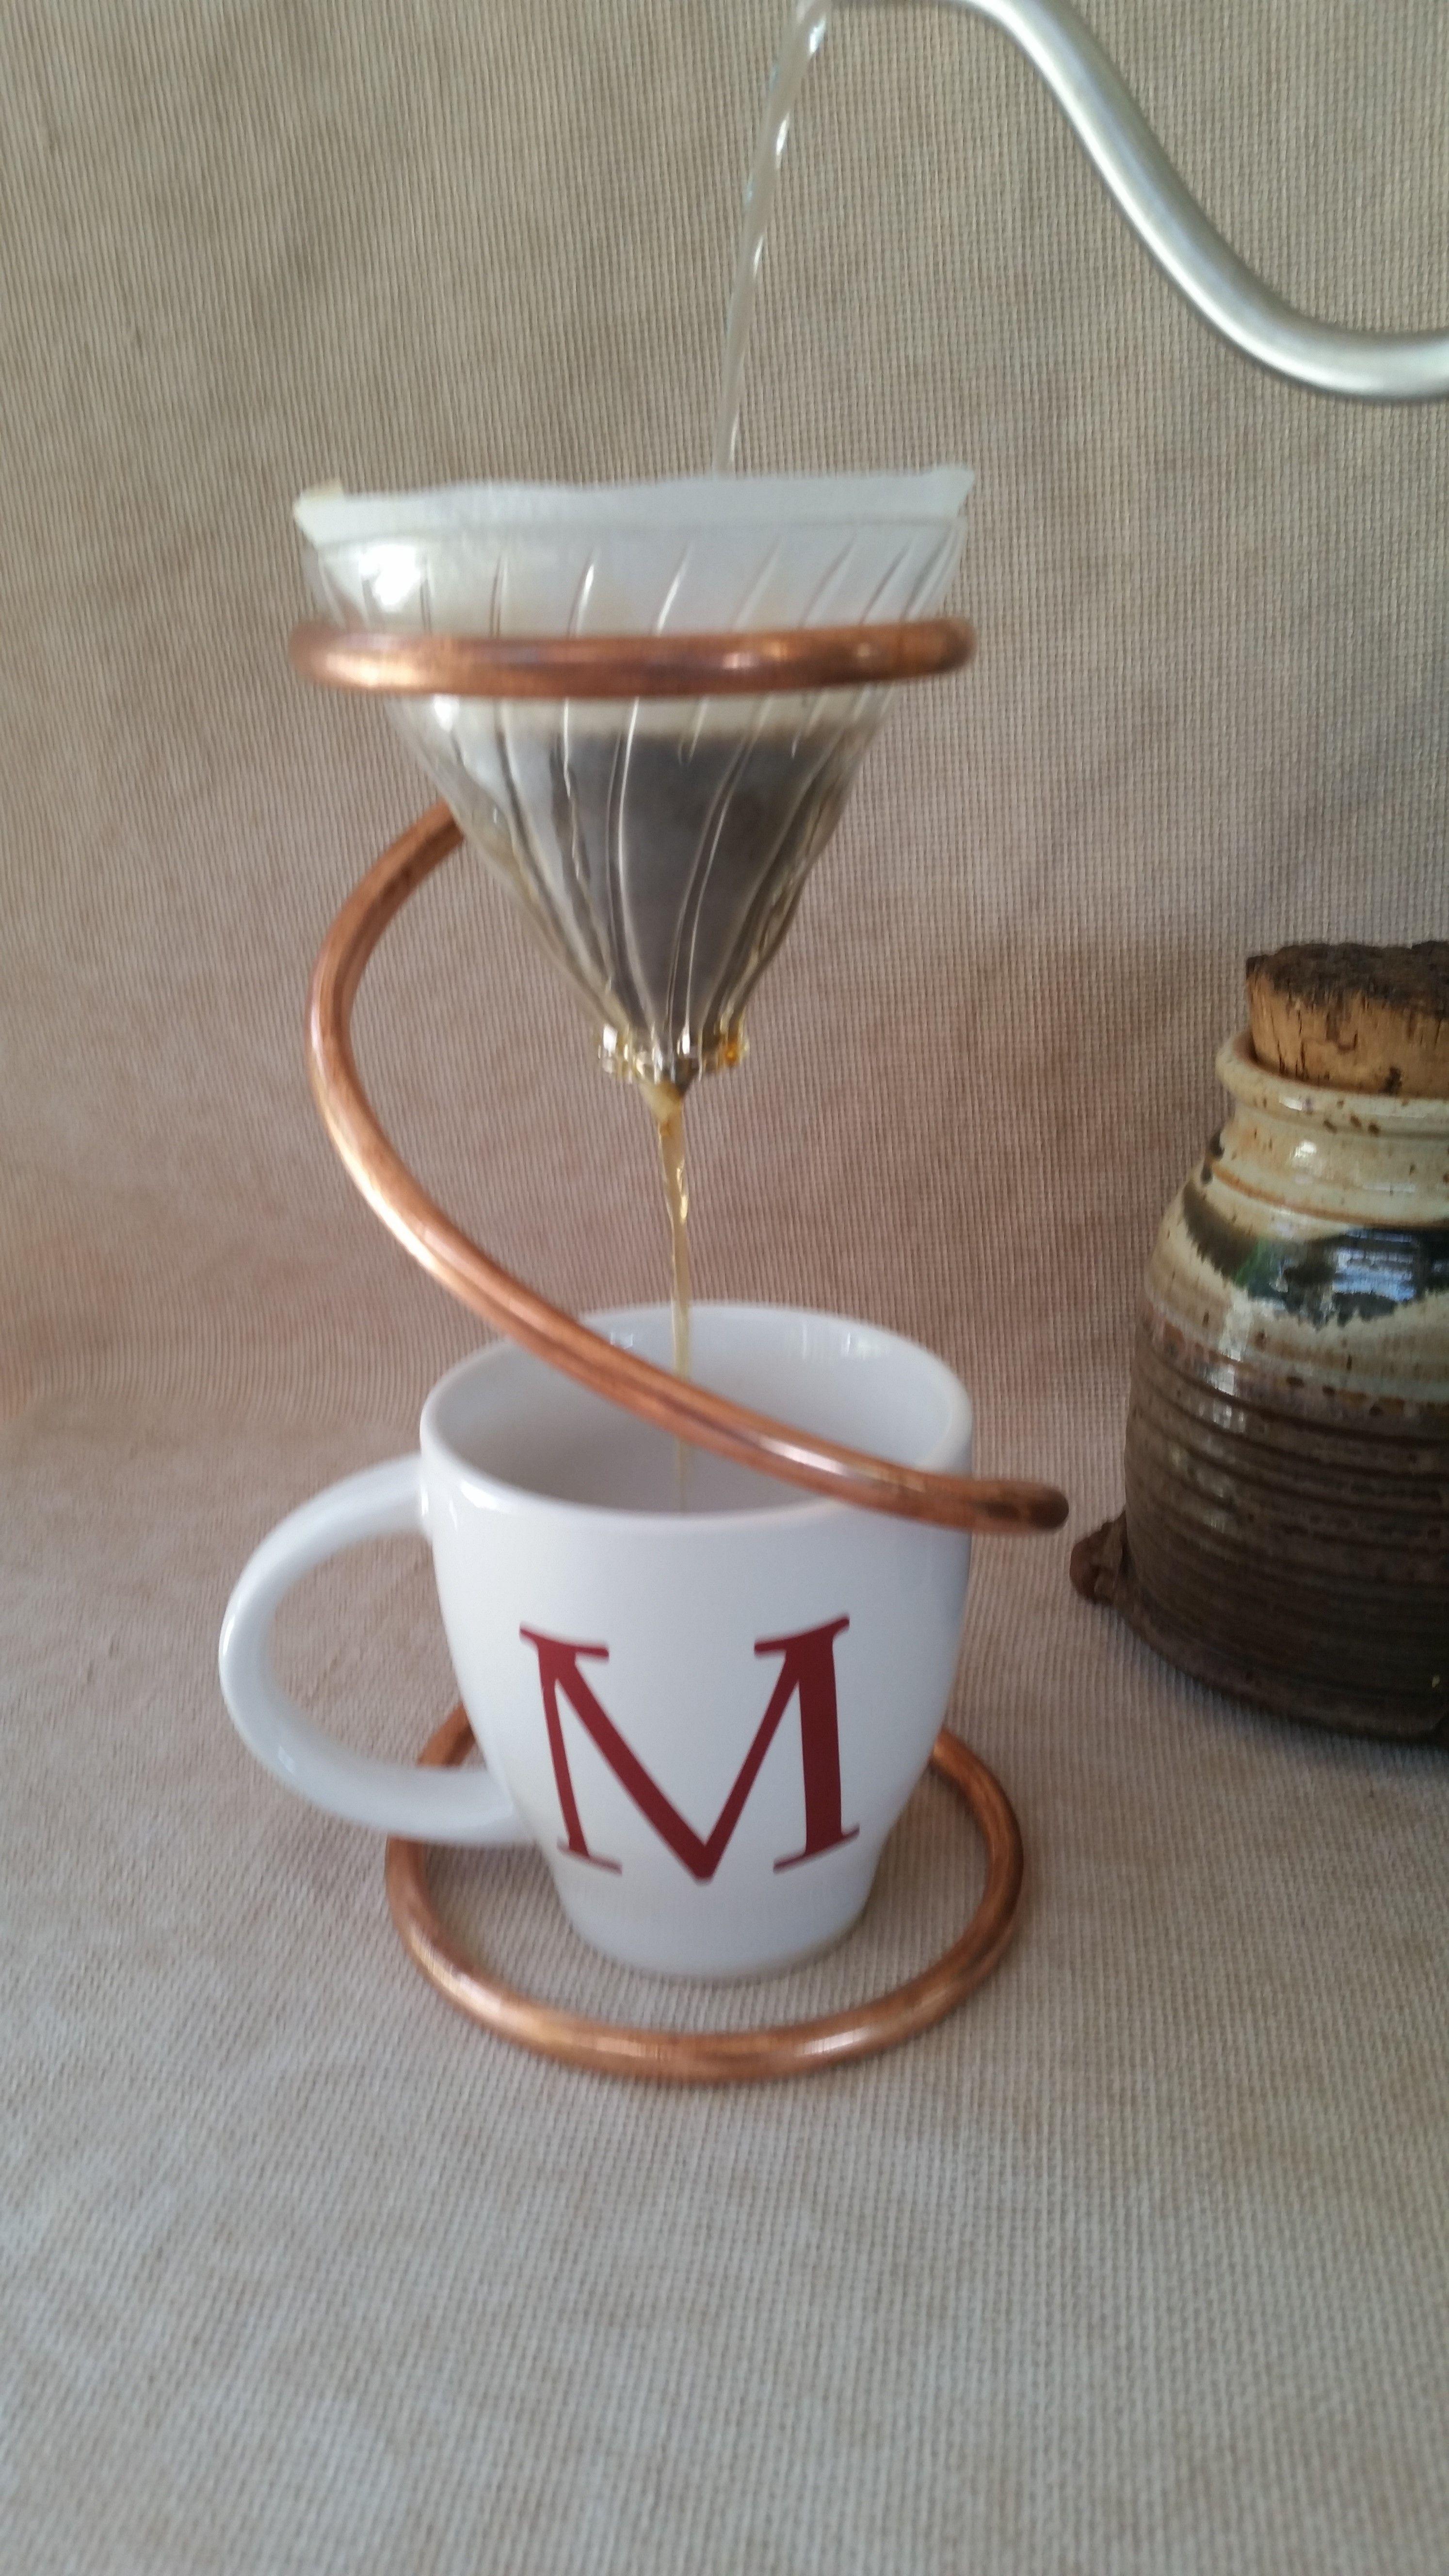 Pour Over Hario V60 Coffee Drip Stand Copper V60 Stand Hario